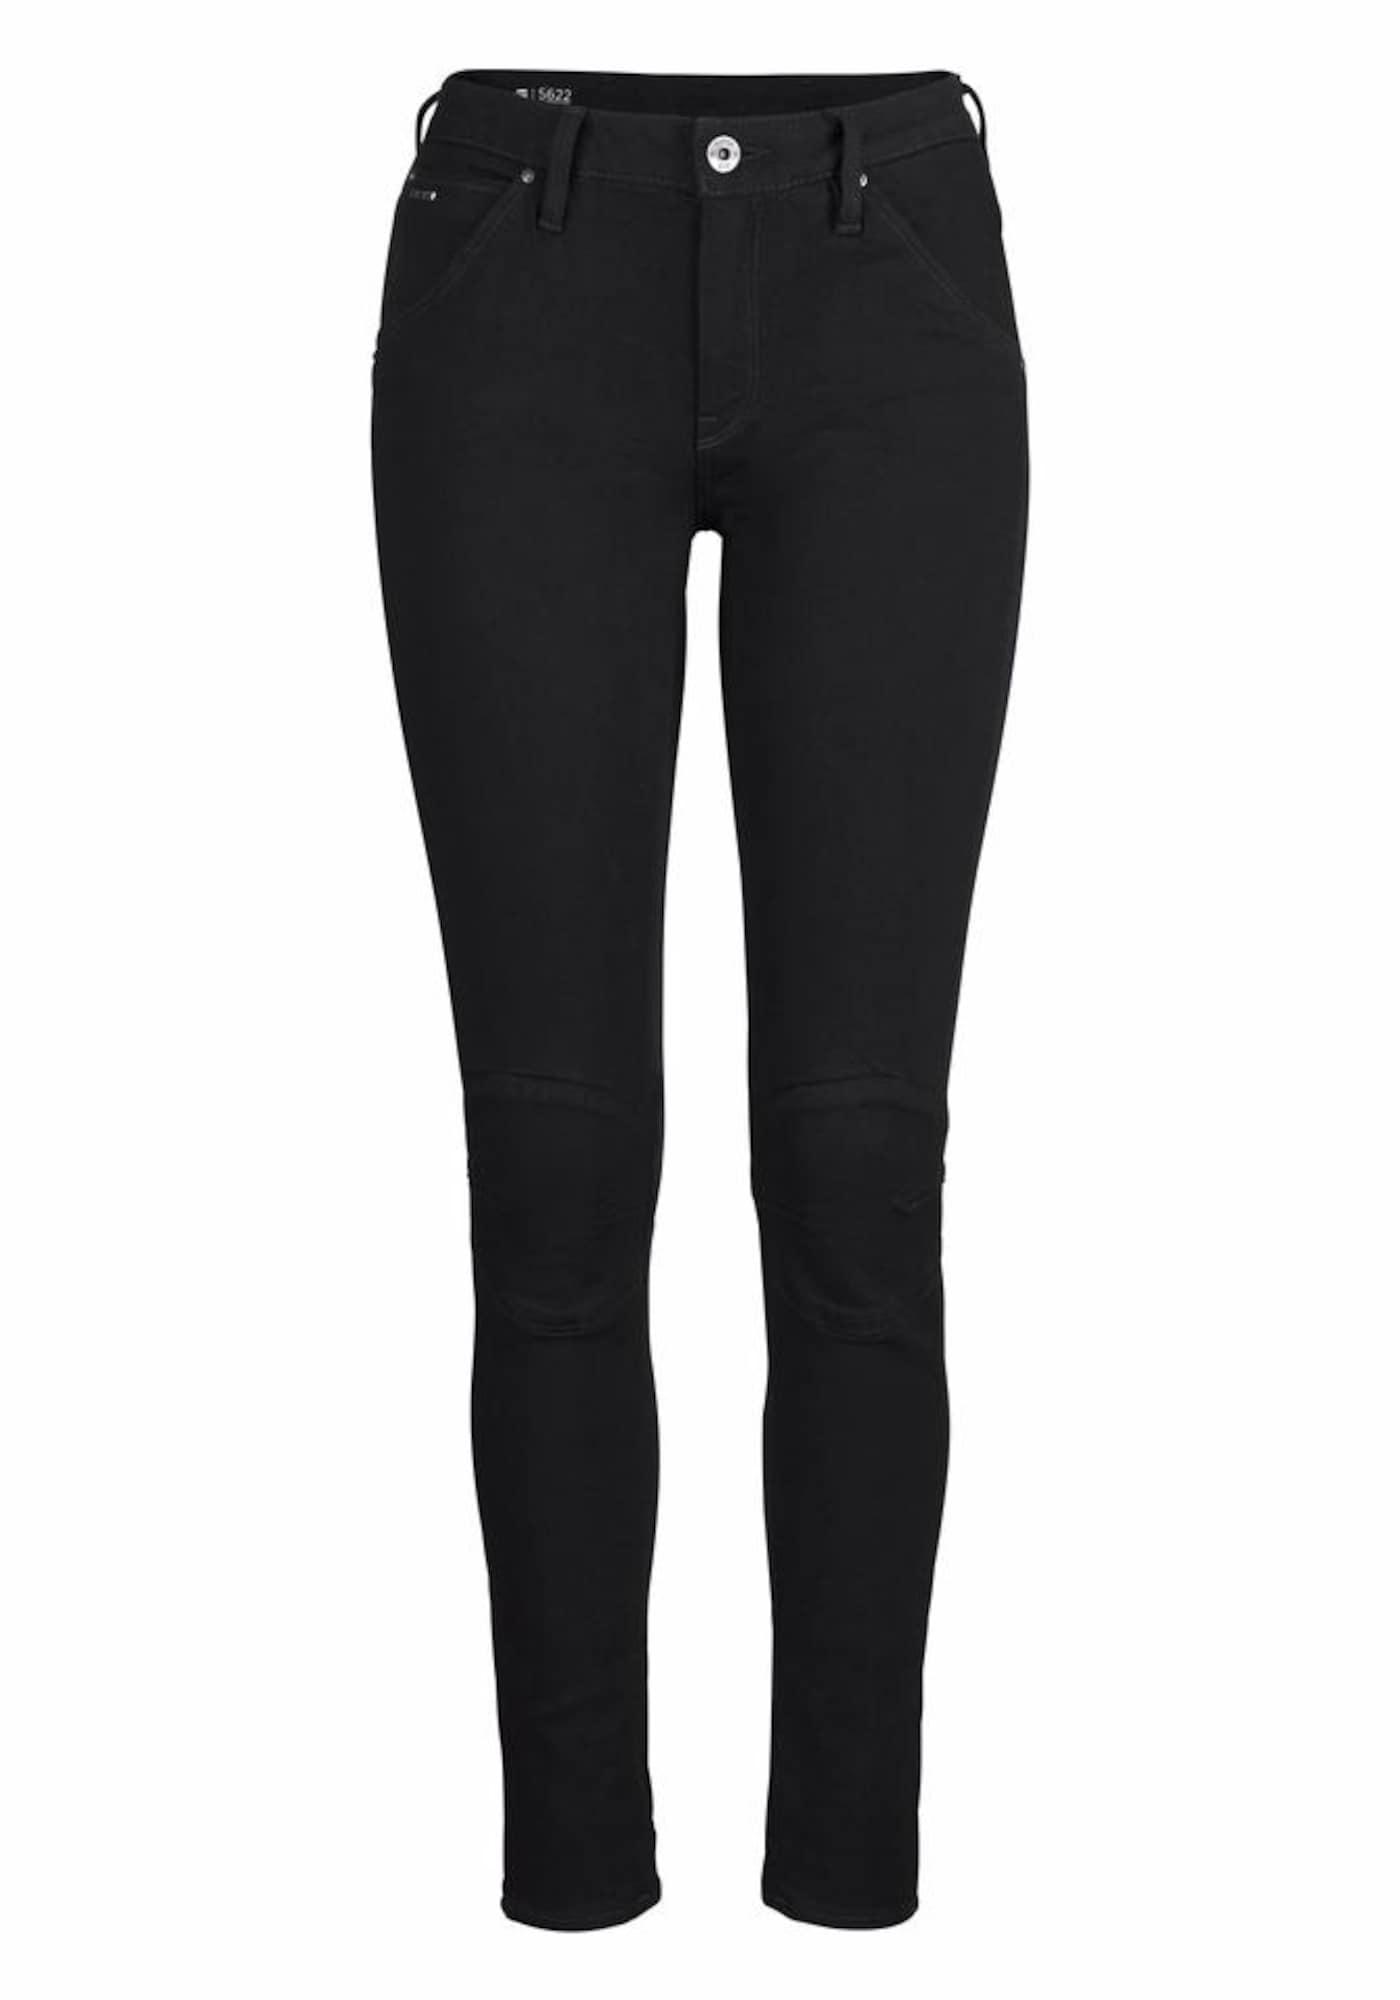 G-STAR RAW Dames Jeans 5622 Mid Skinny zwart